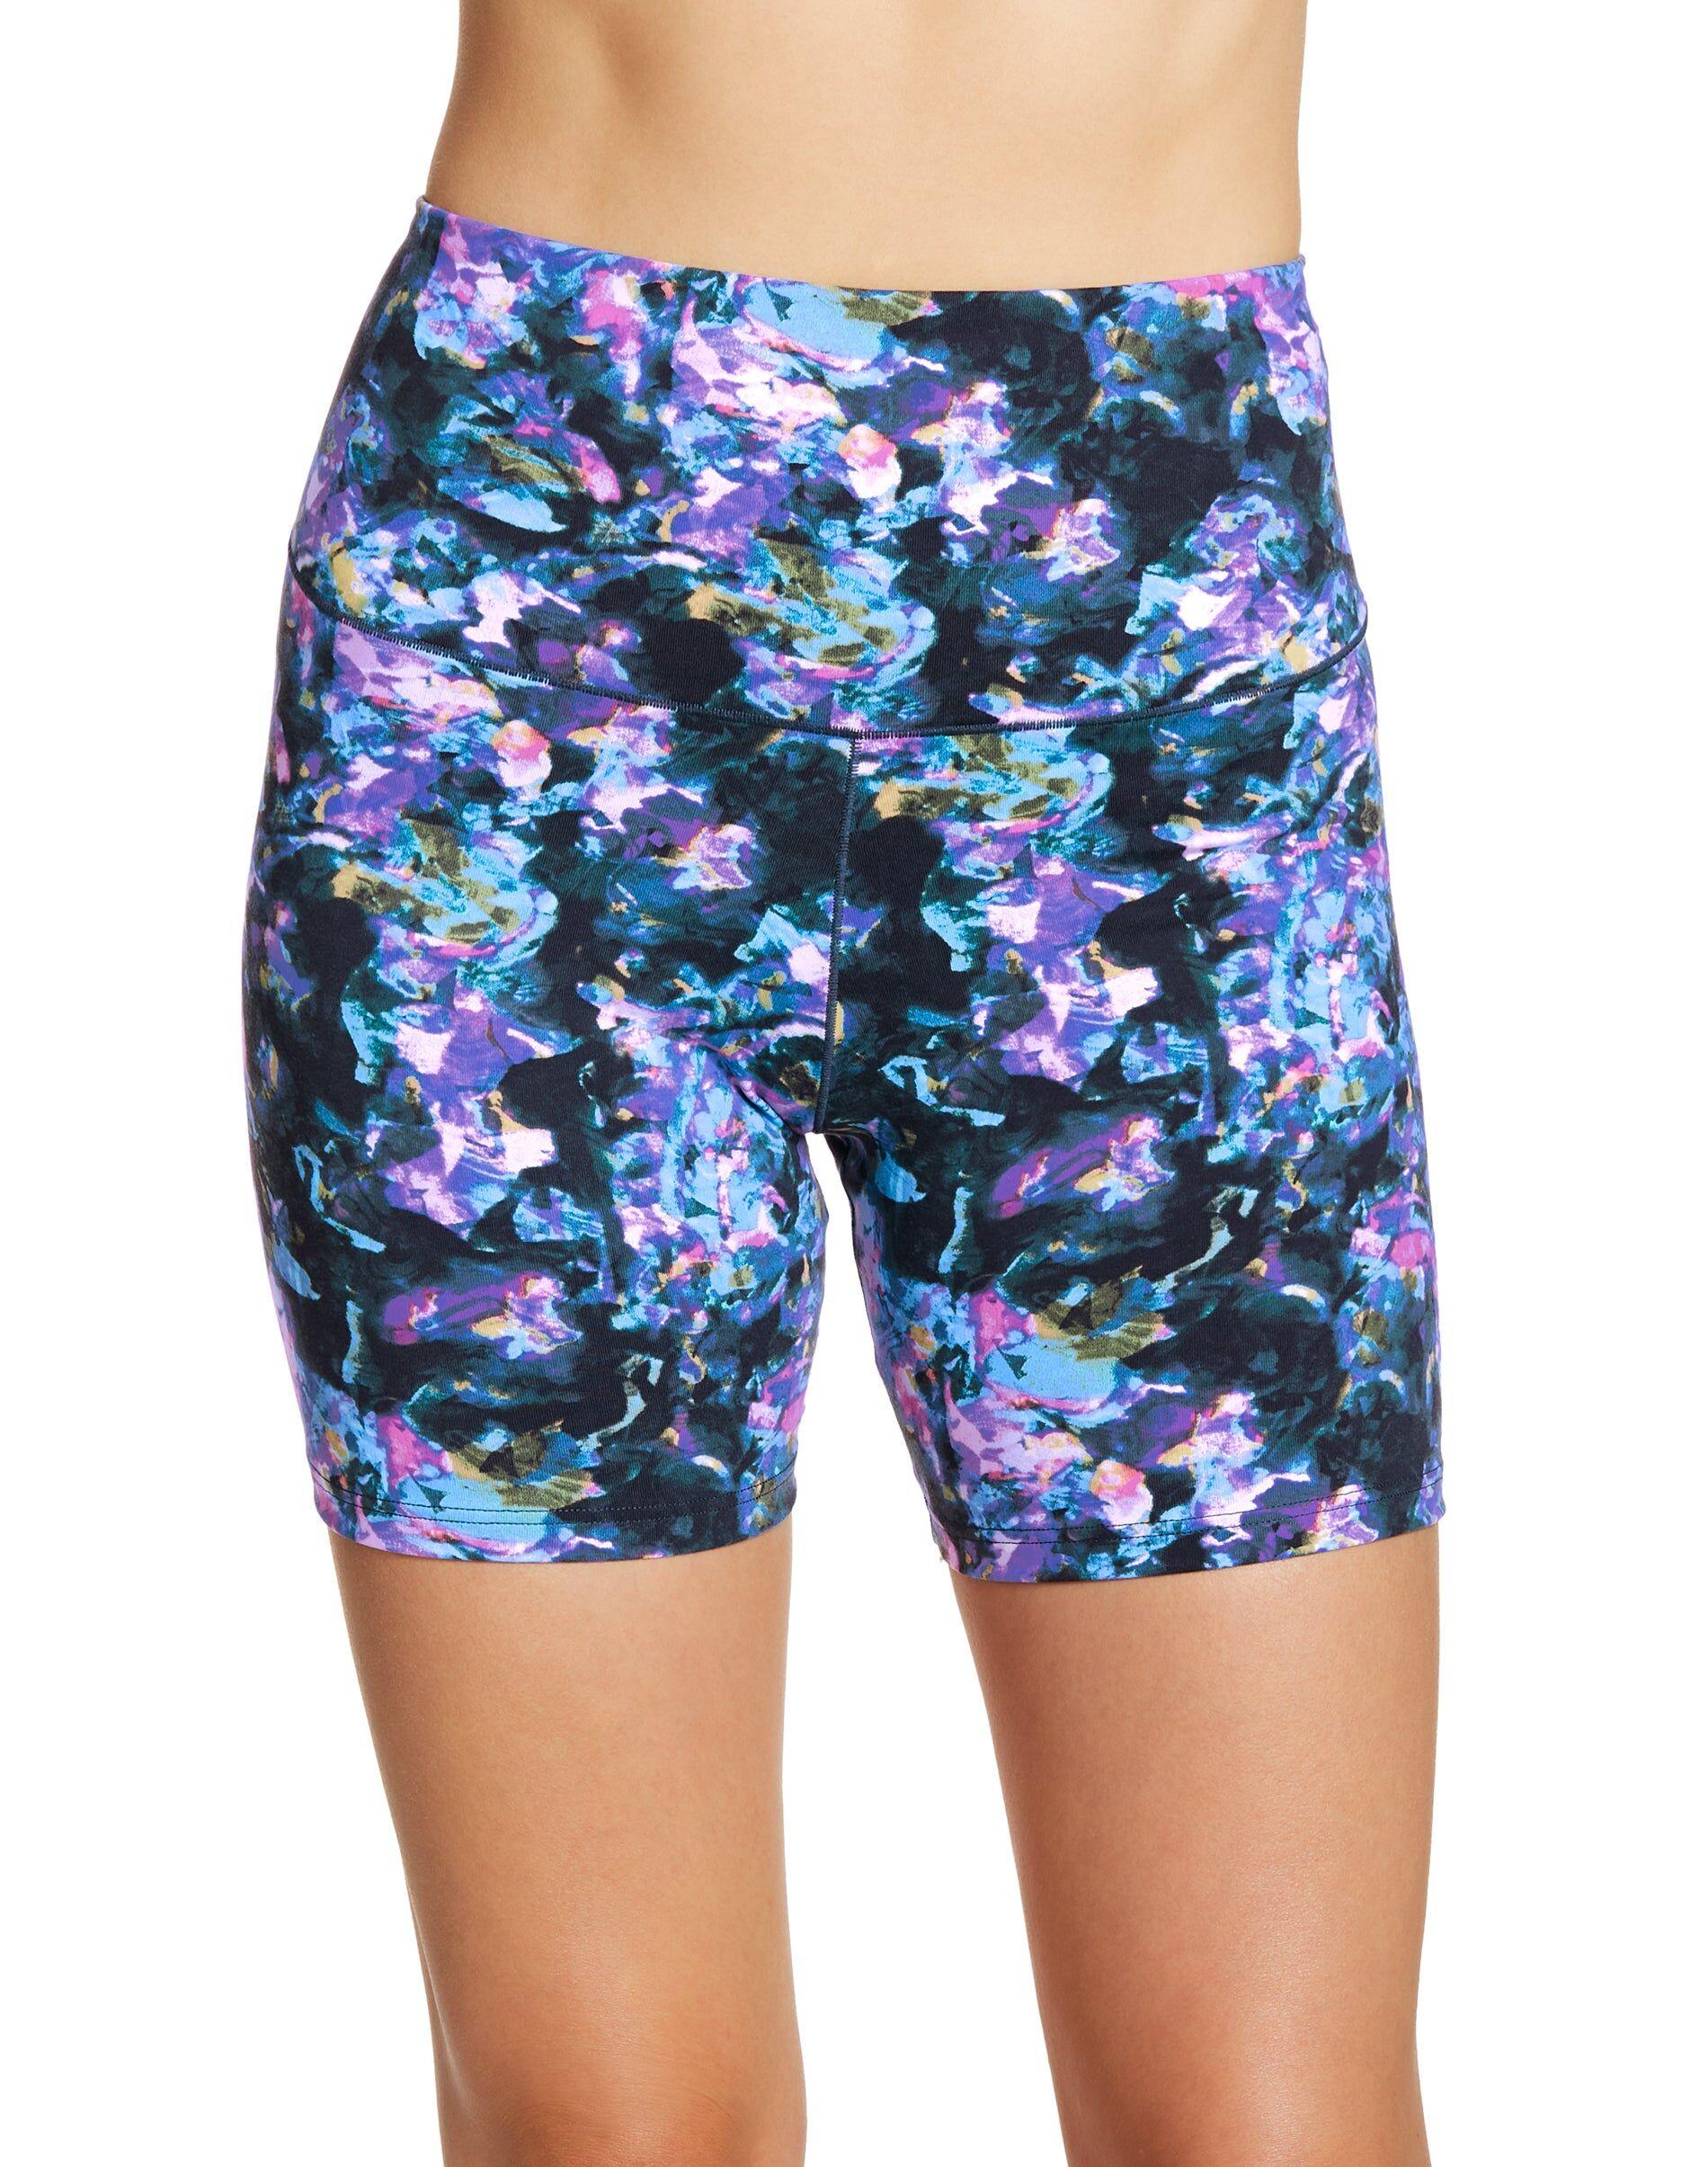 Maidenform Women's Cool Comfort Bike Short Soft Energy Floral Print/Multi XL